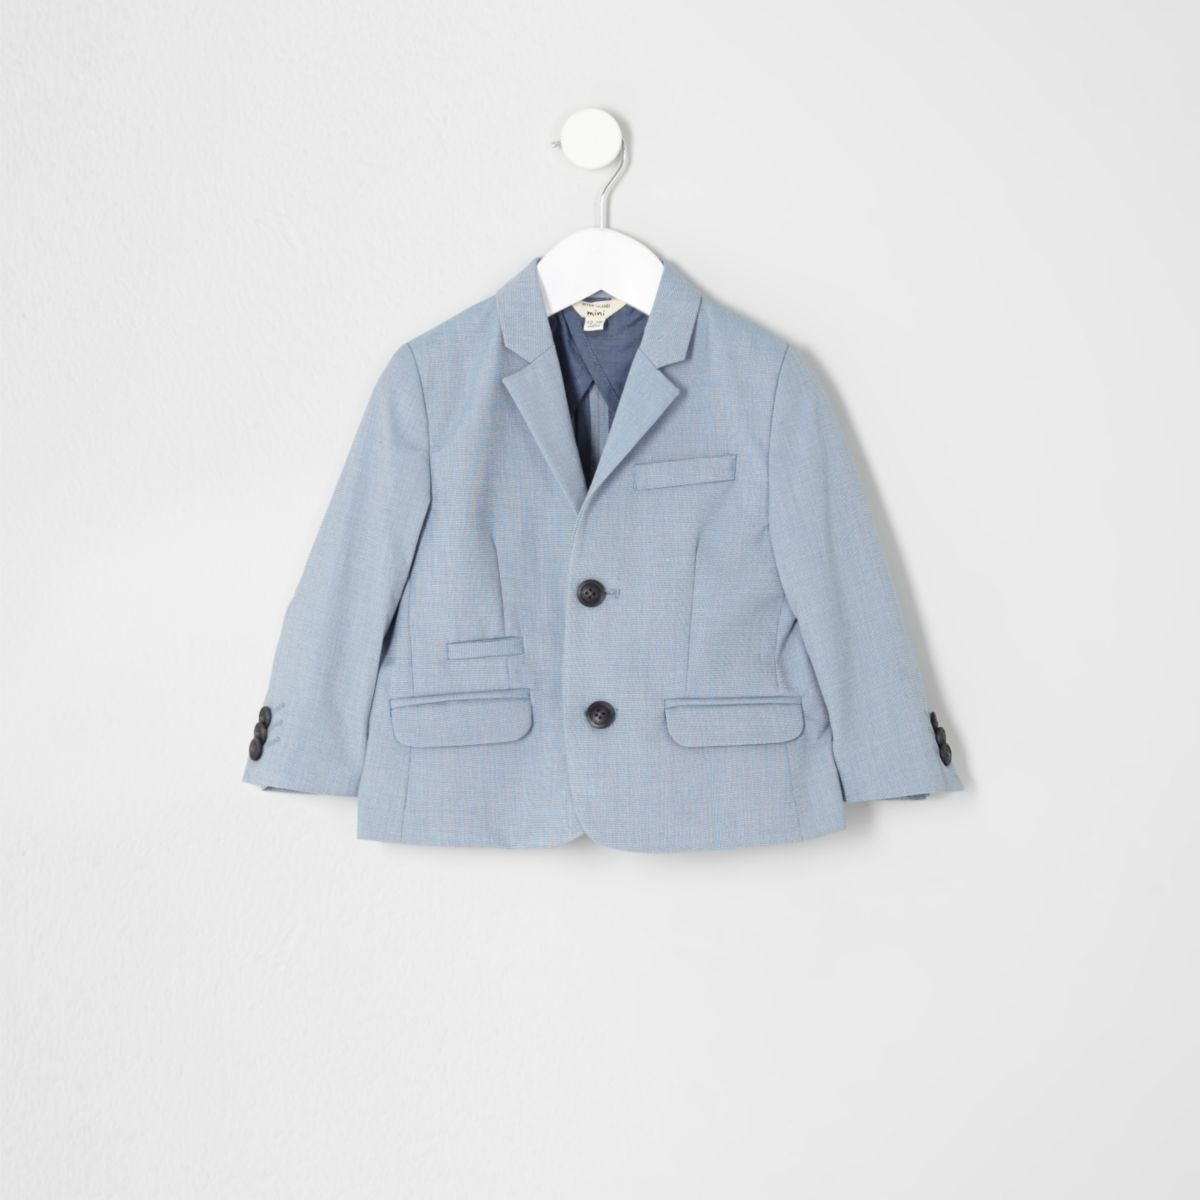 Mini boys light blue suit jacket